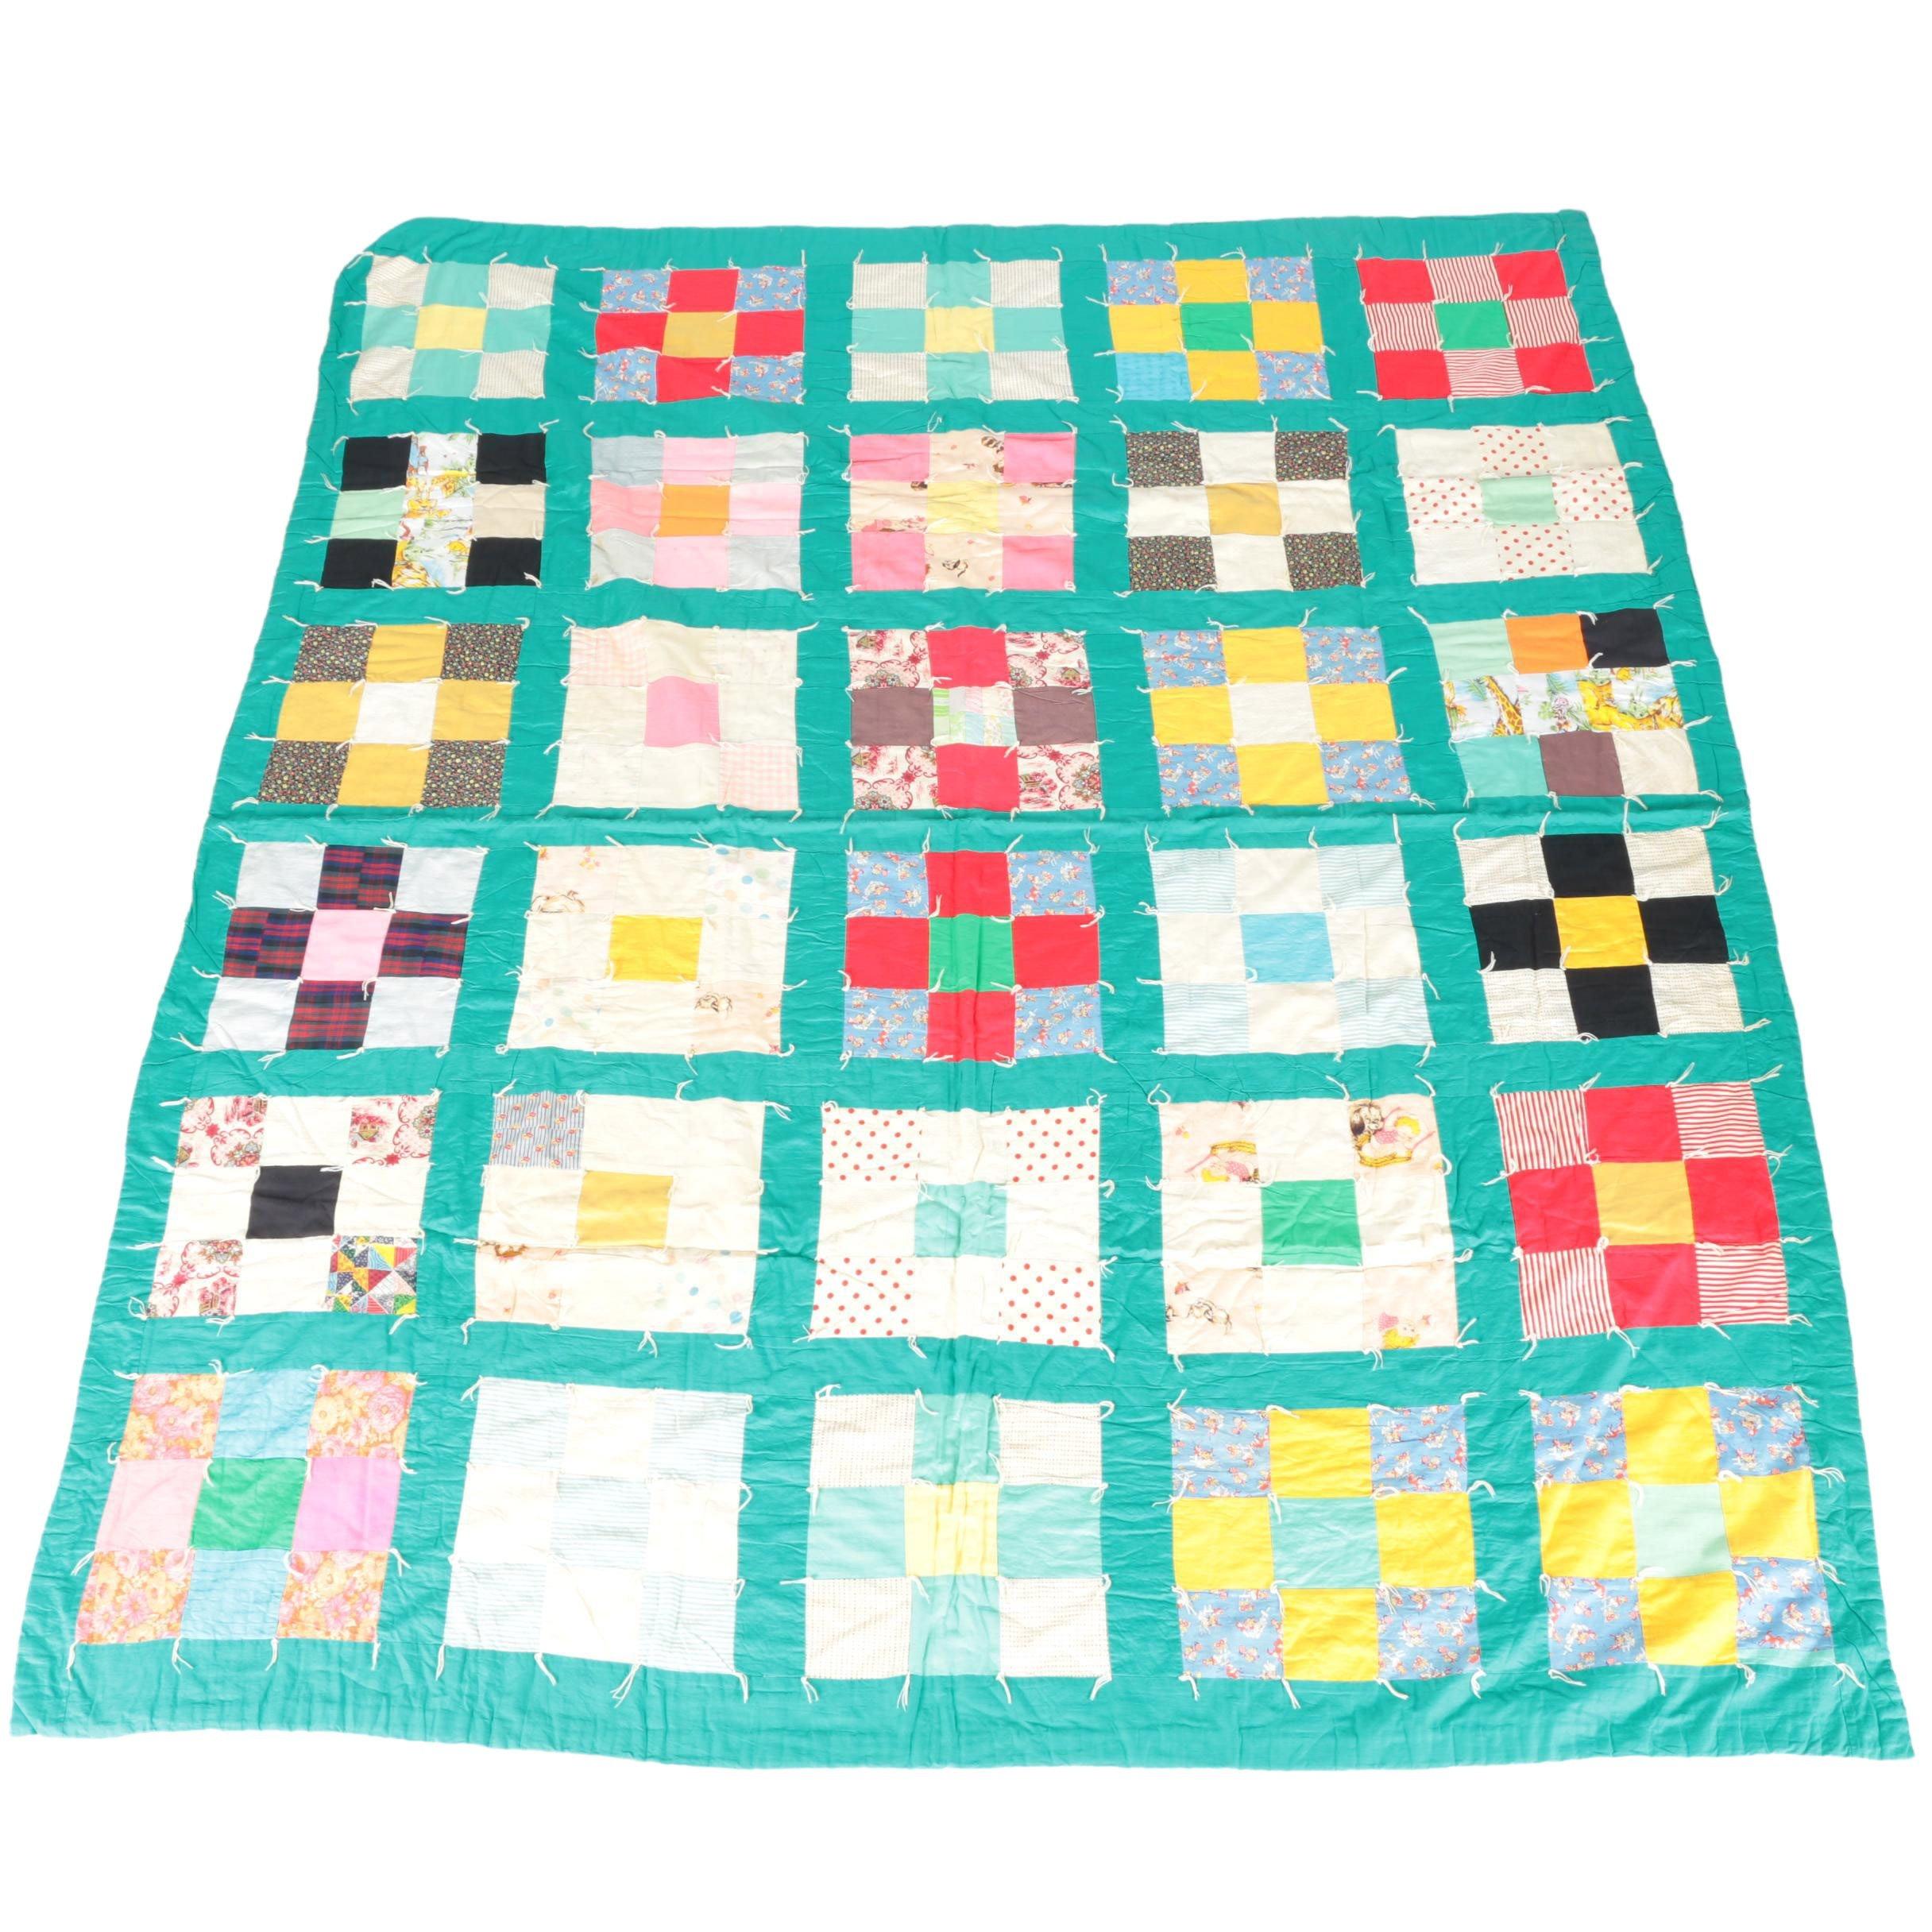 Handmade Patchwork Tack Quilt